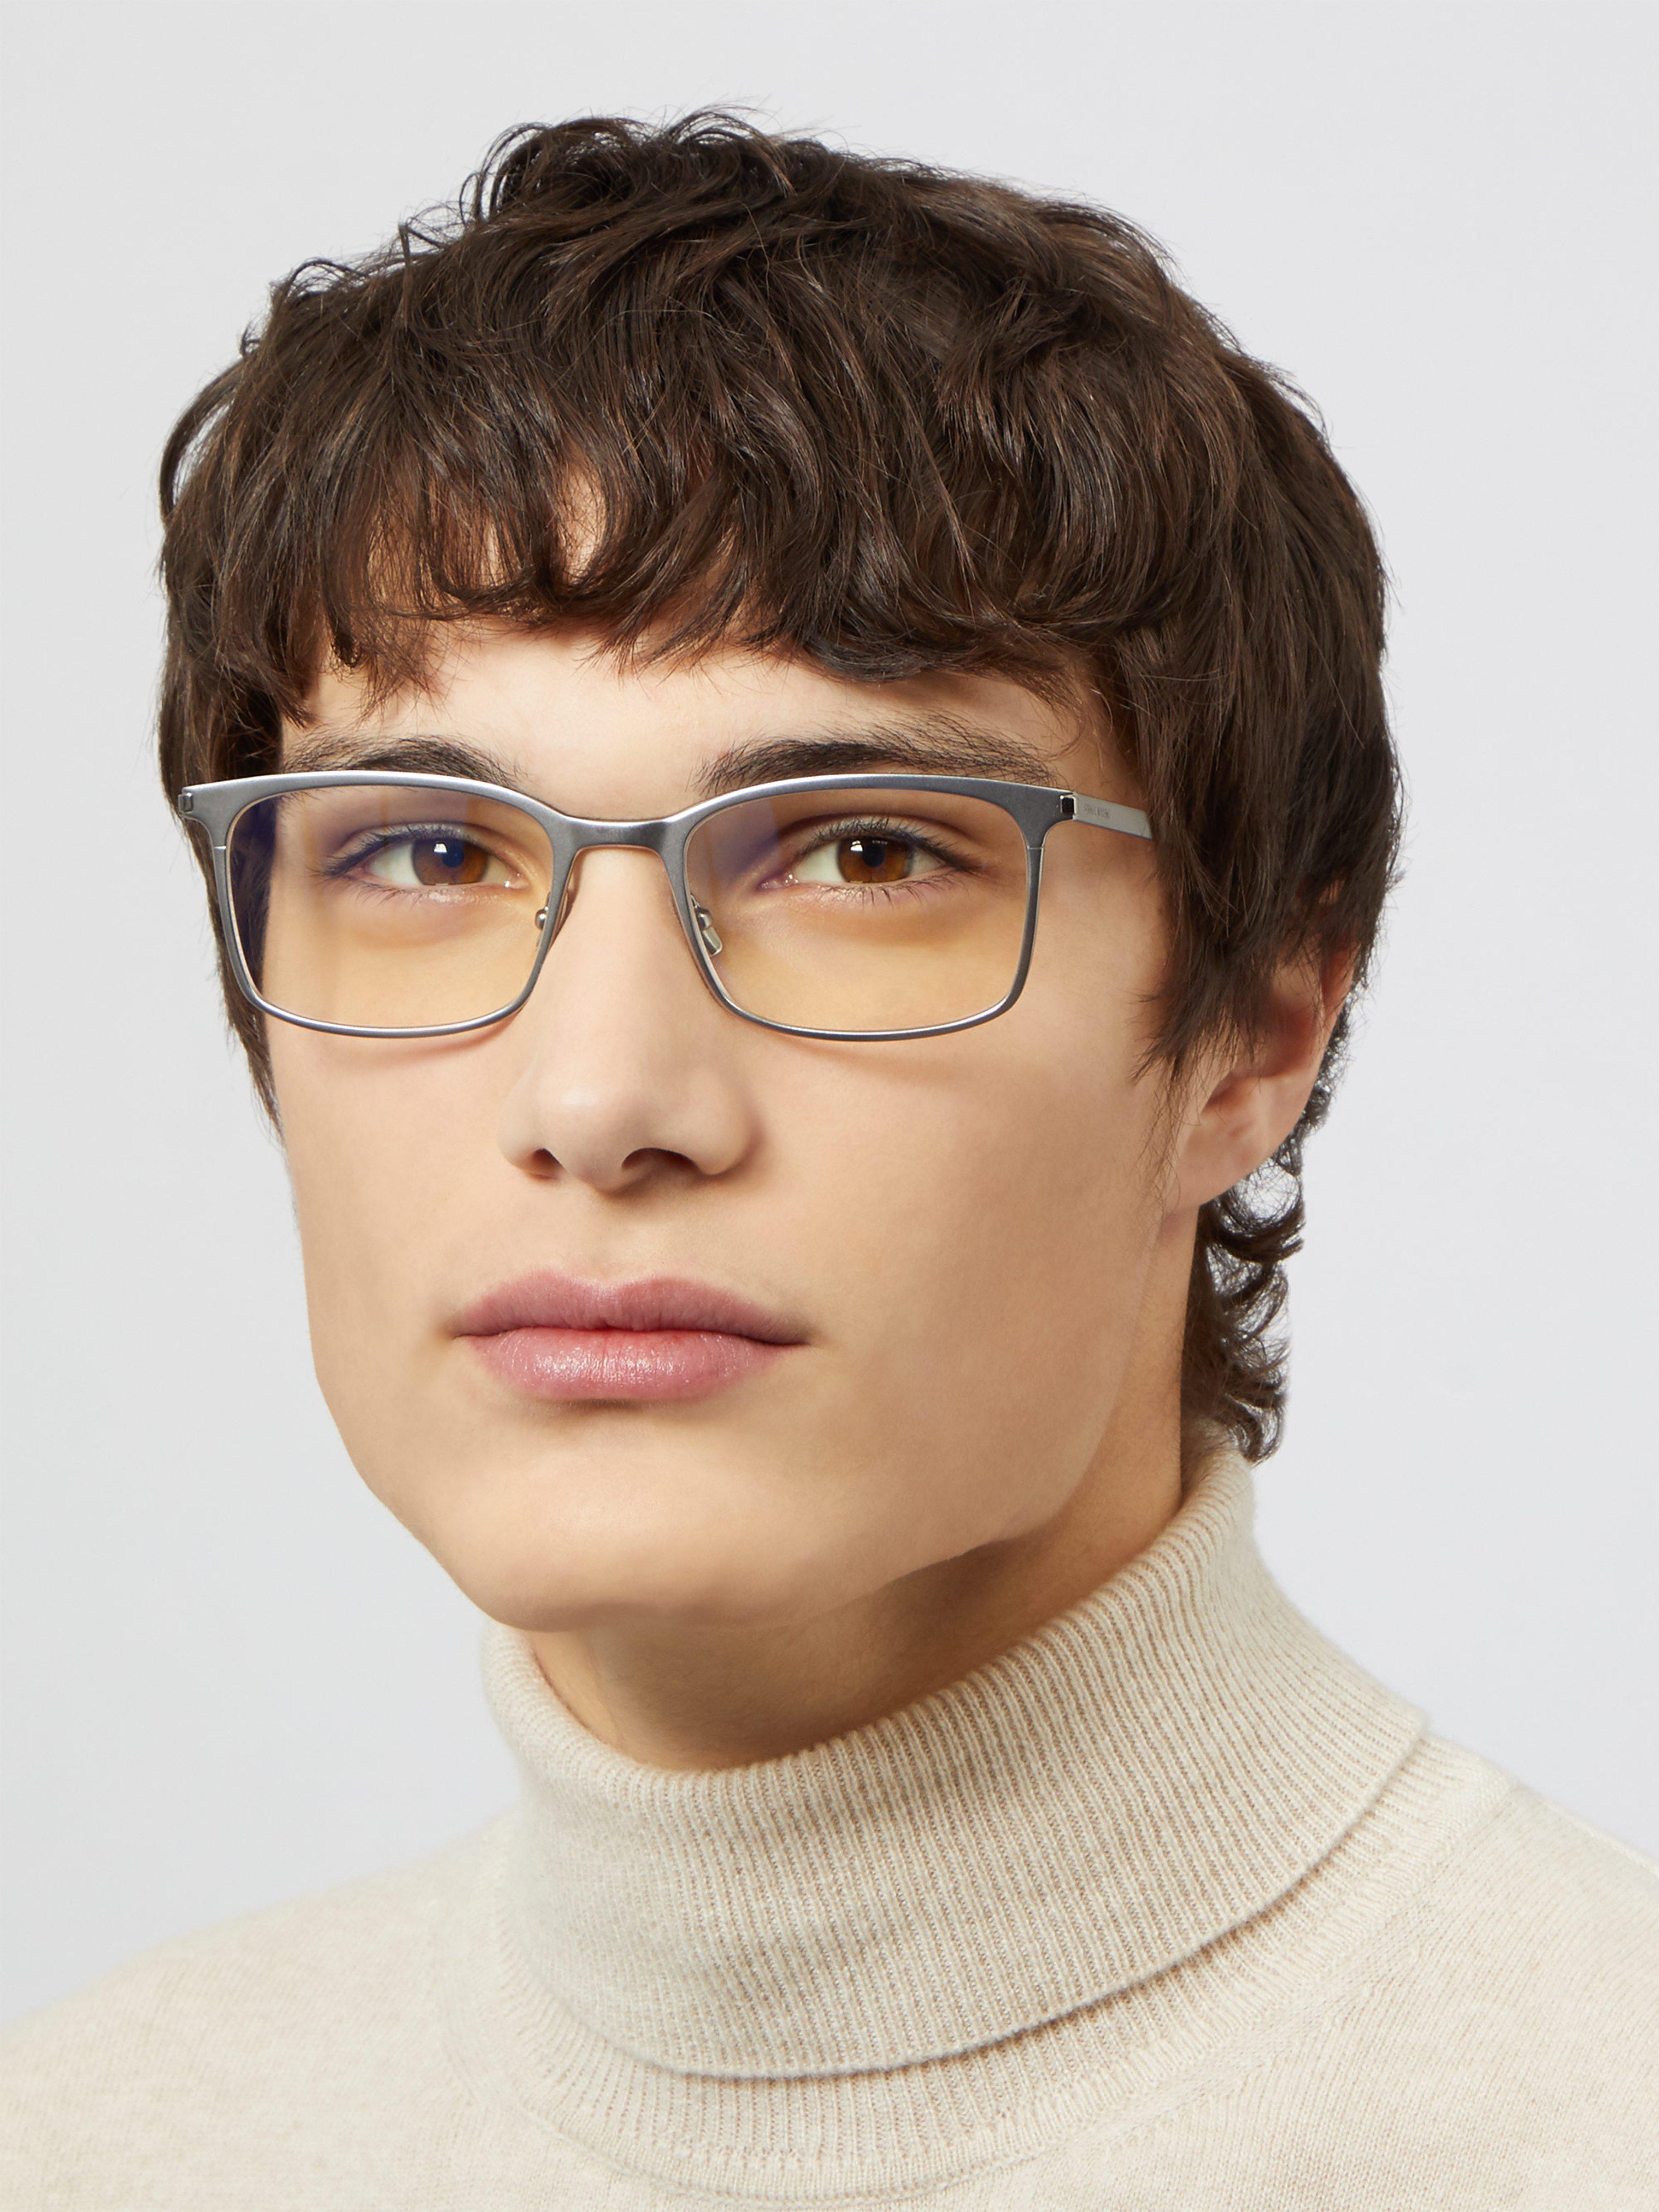 842b6c9416d6 Saint Laurent Square Frame Metal Glasses in Metallic for Men - Lyst